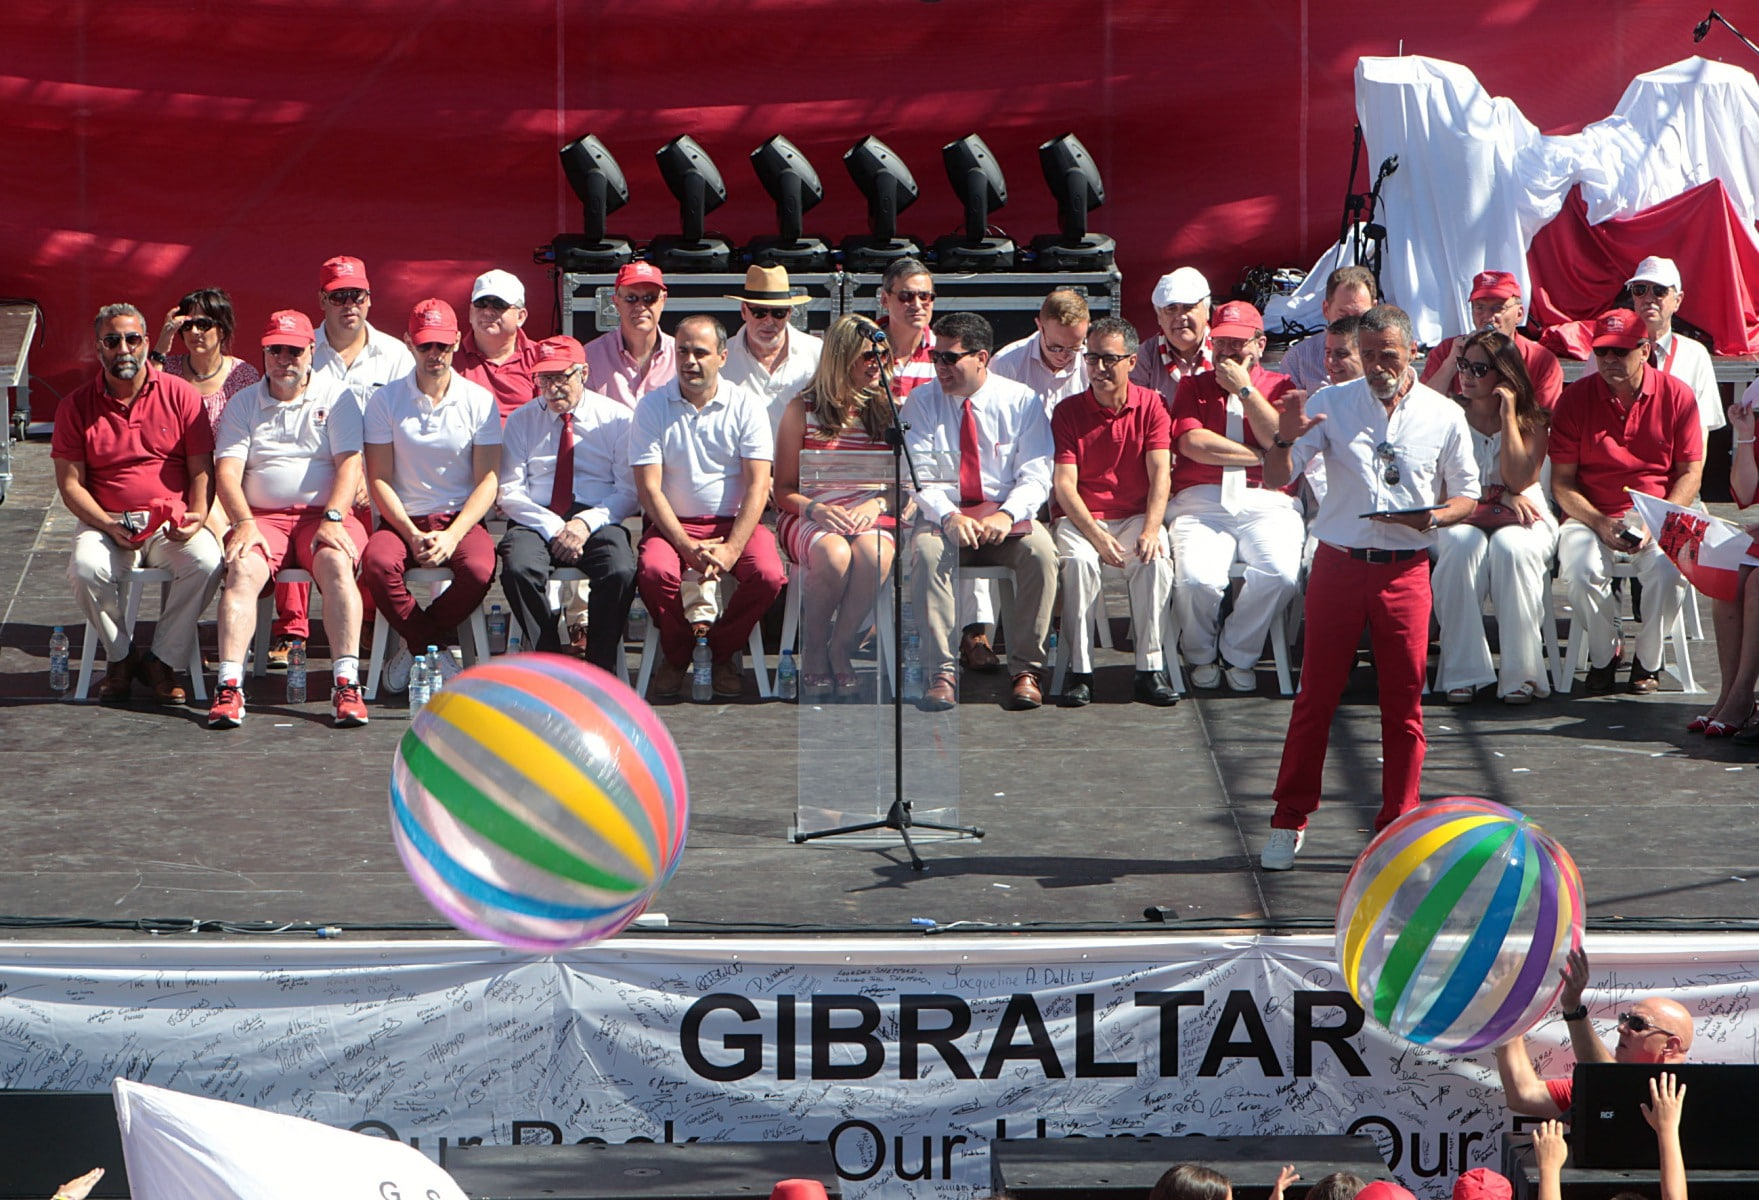 160910-national-day-gibraltar-2016-122_29494980092_o